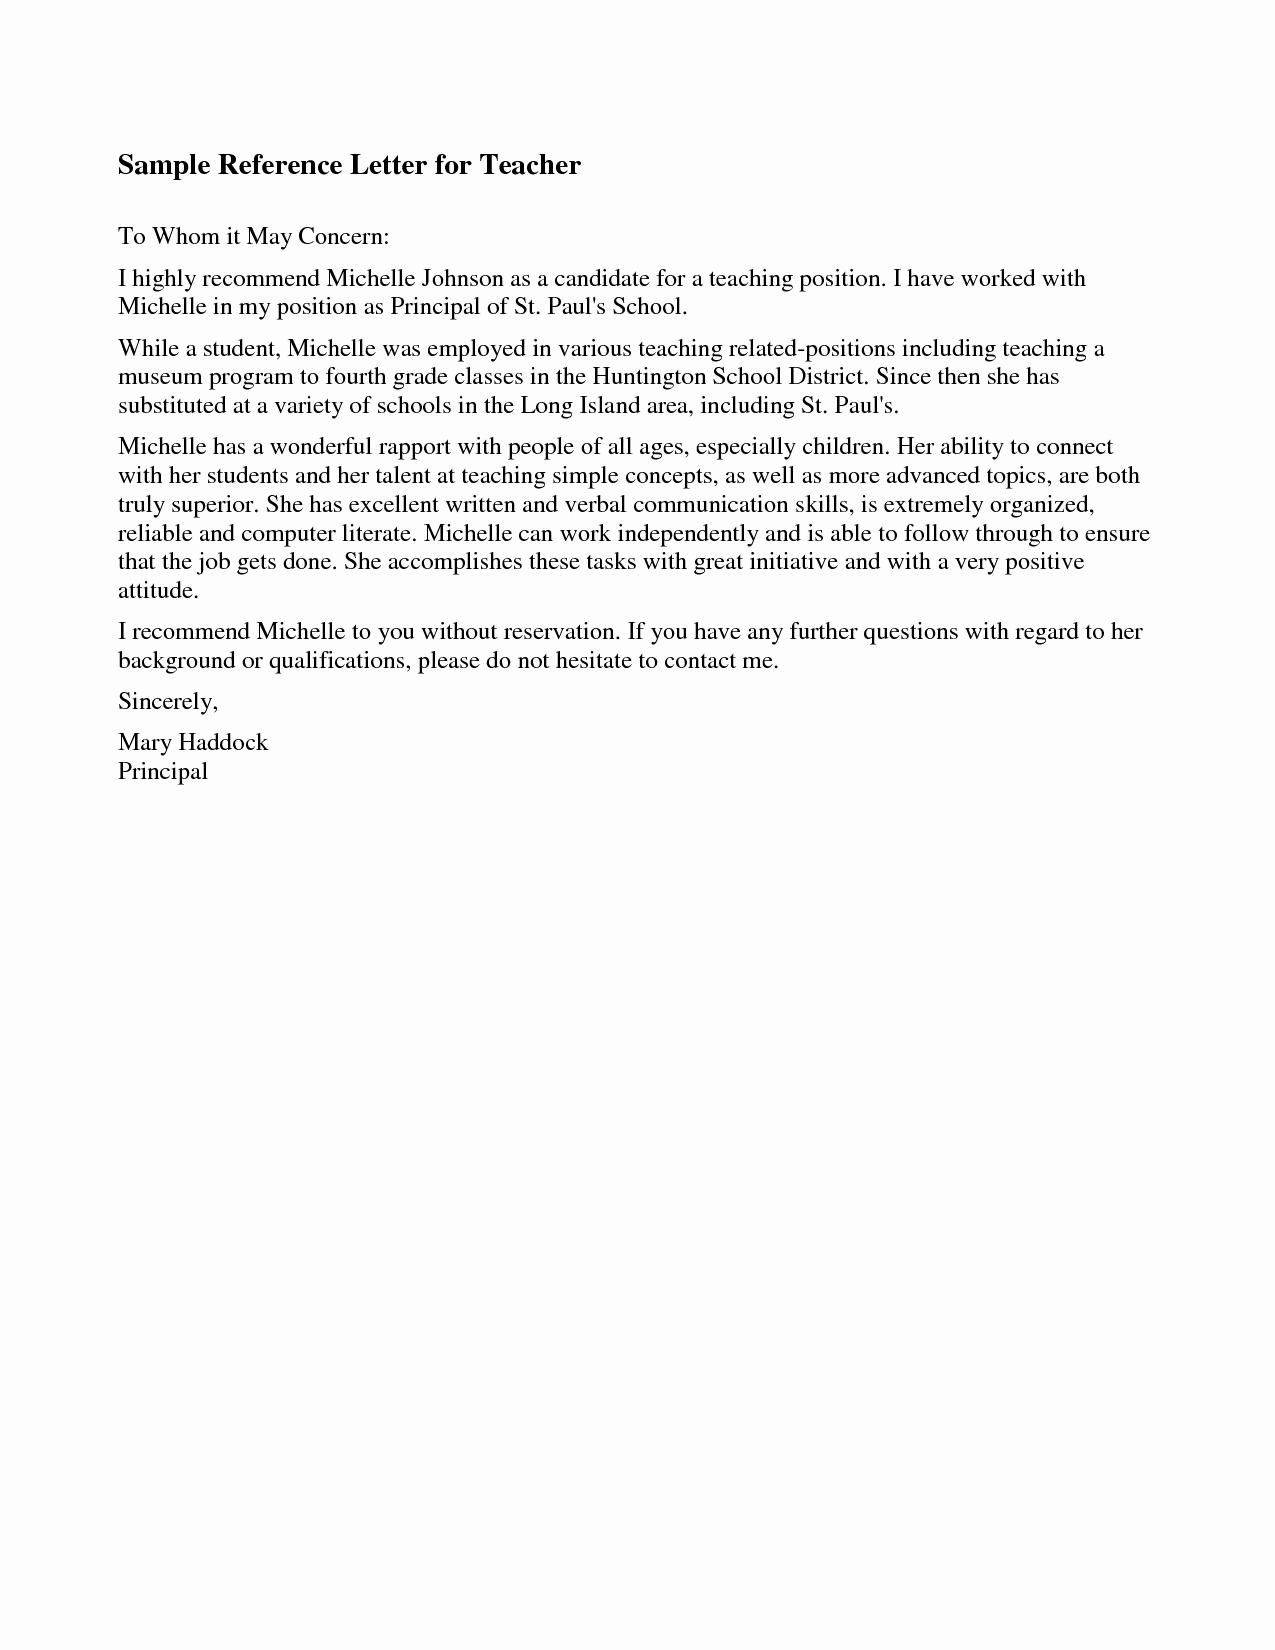 Recommendation Letter Template for Teacher Luxury Best S Of Re Mendation Letter for Teaching Position